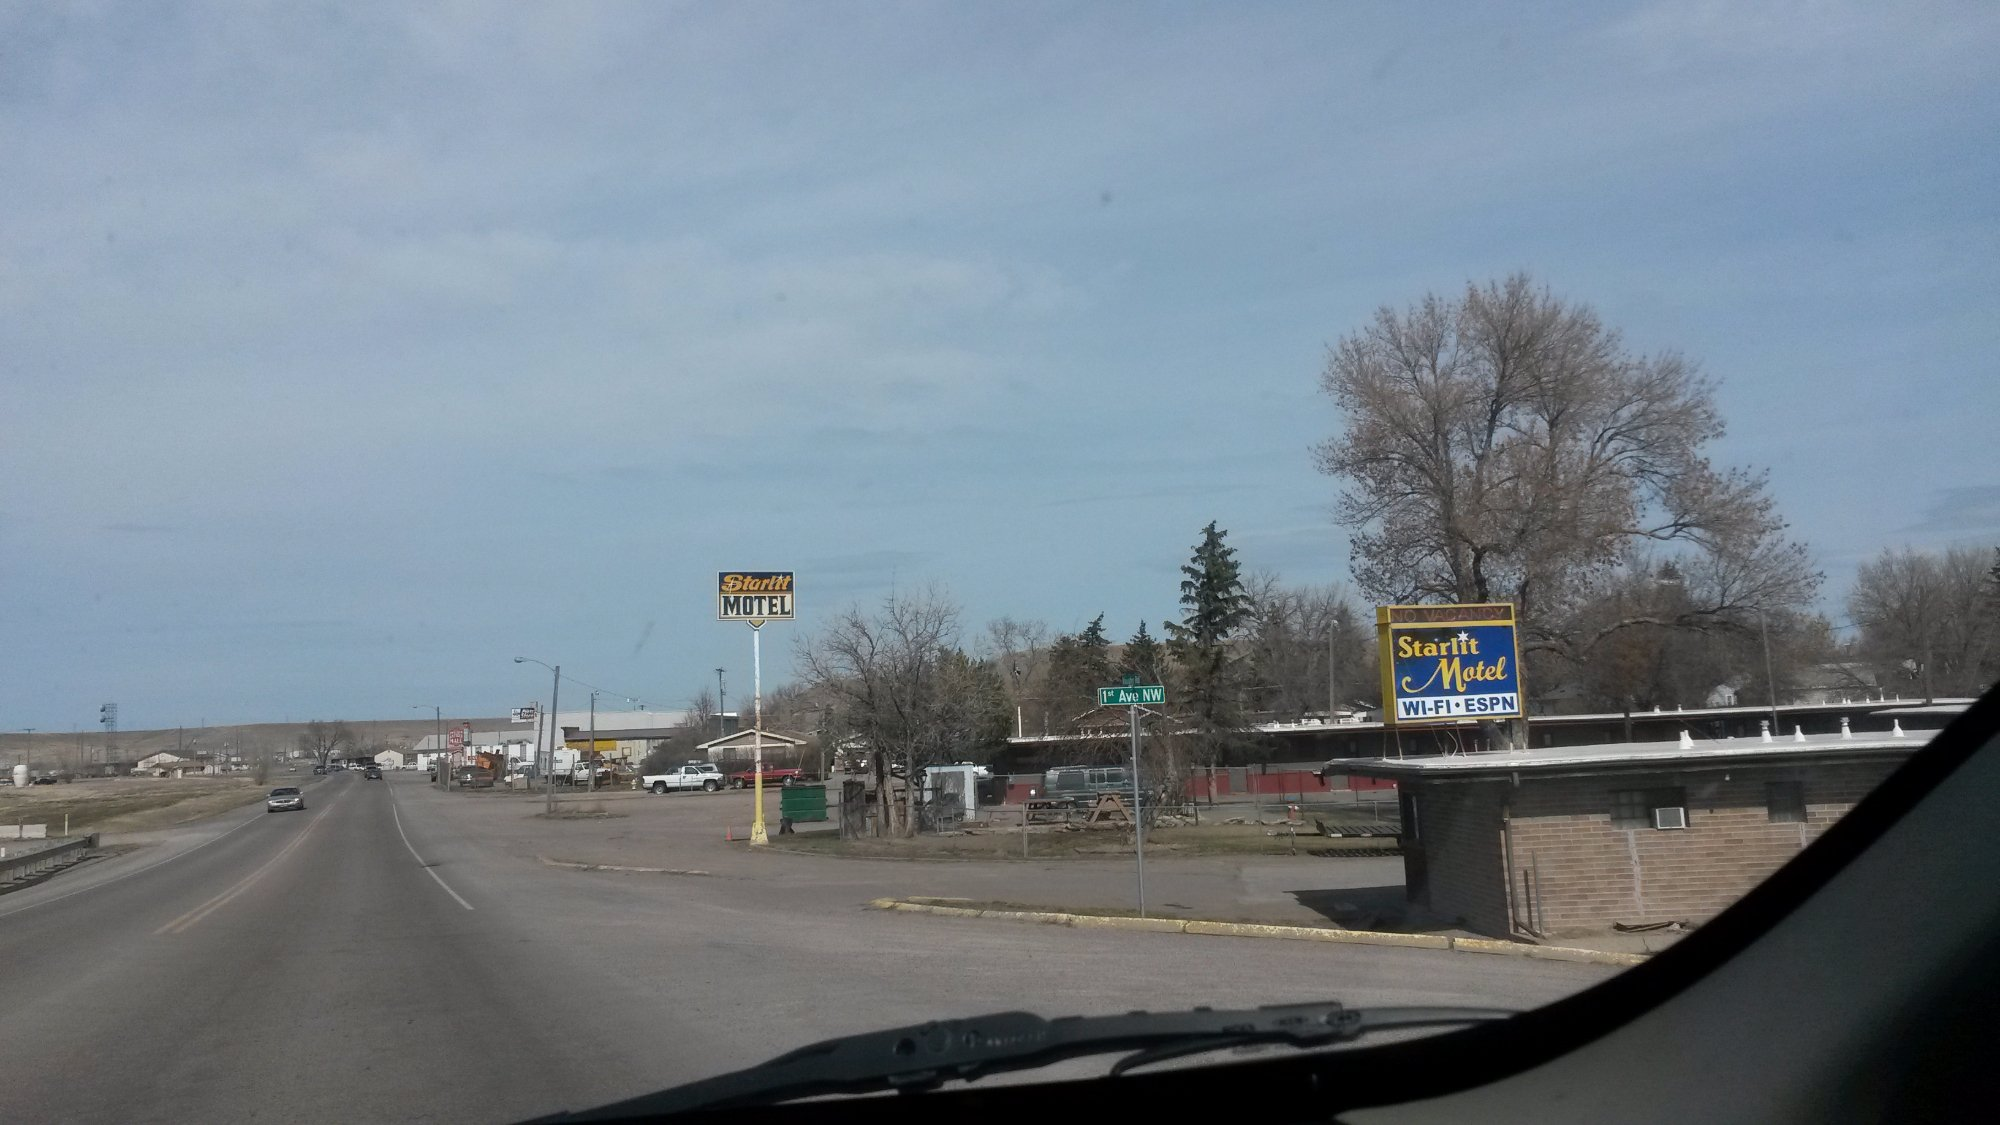 Starlit Motel